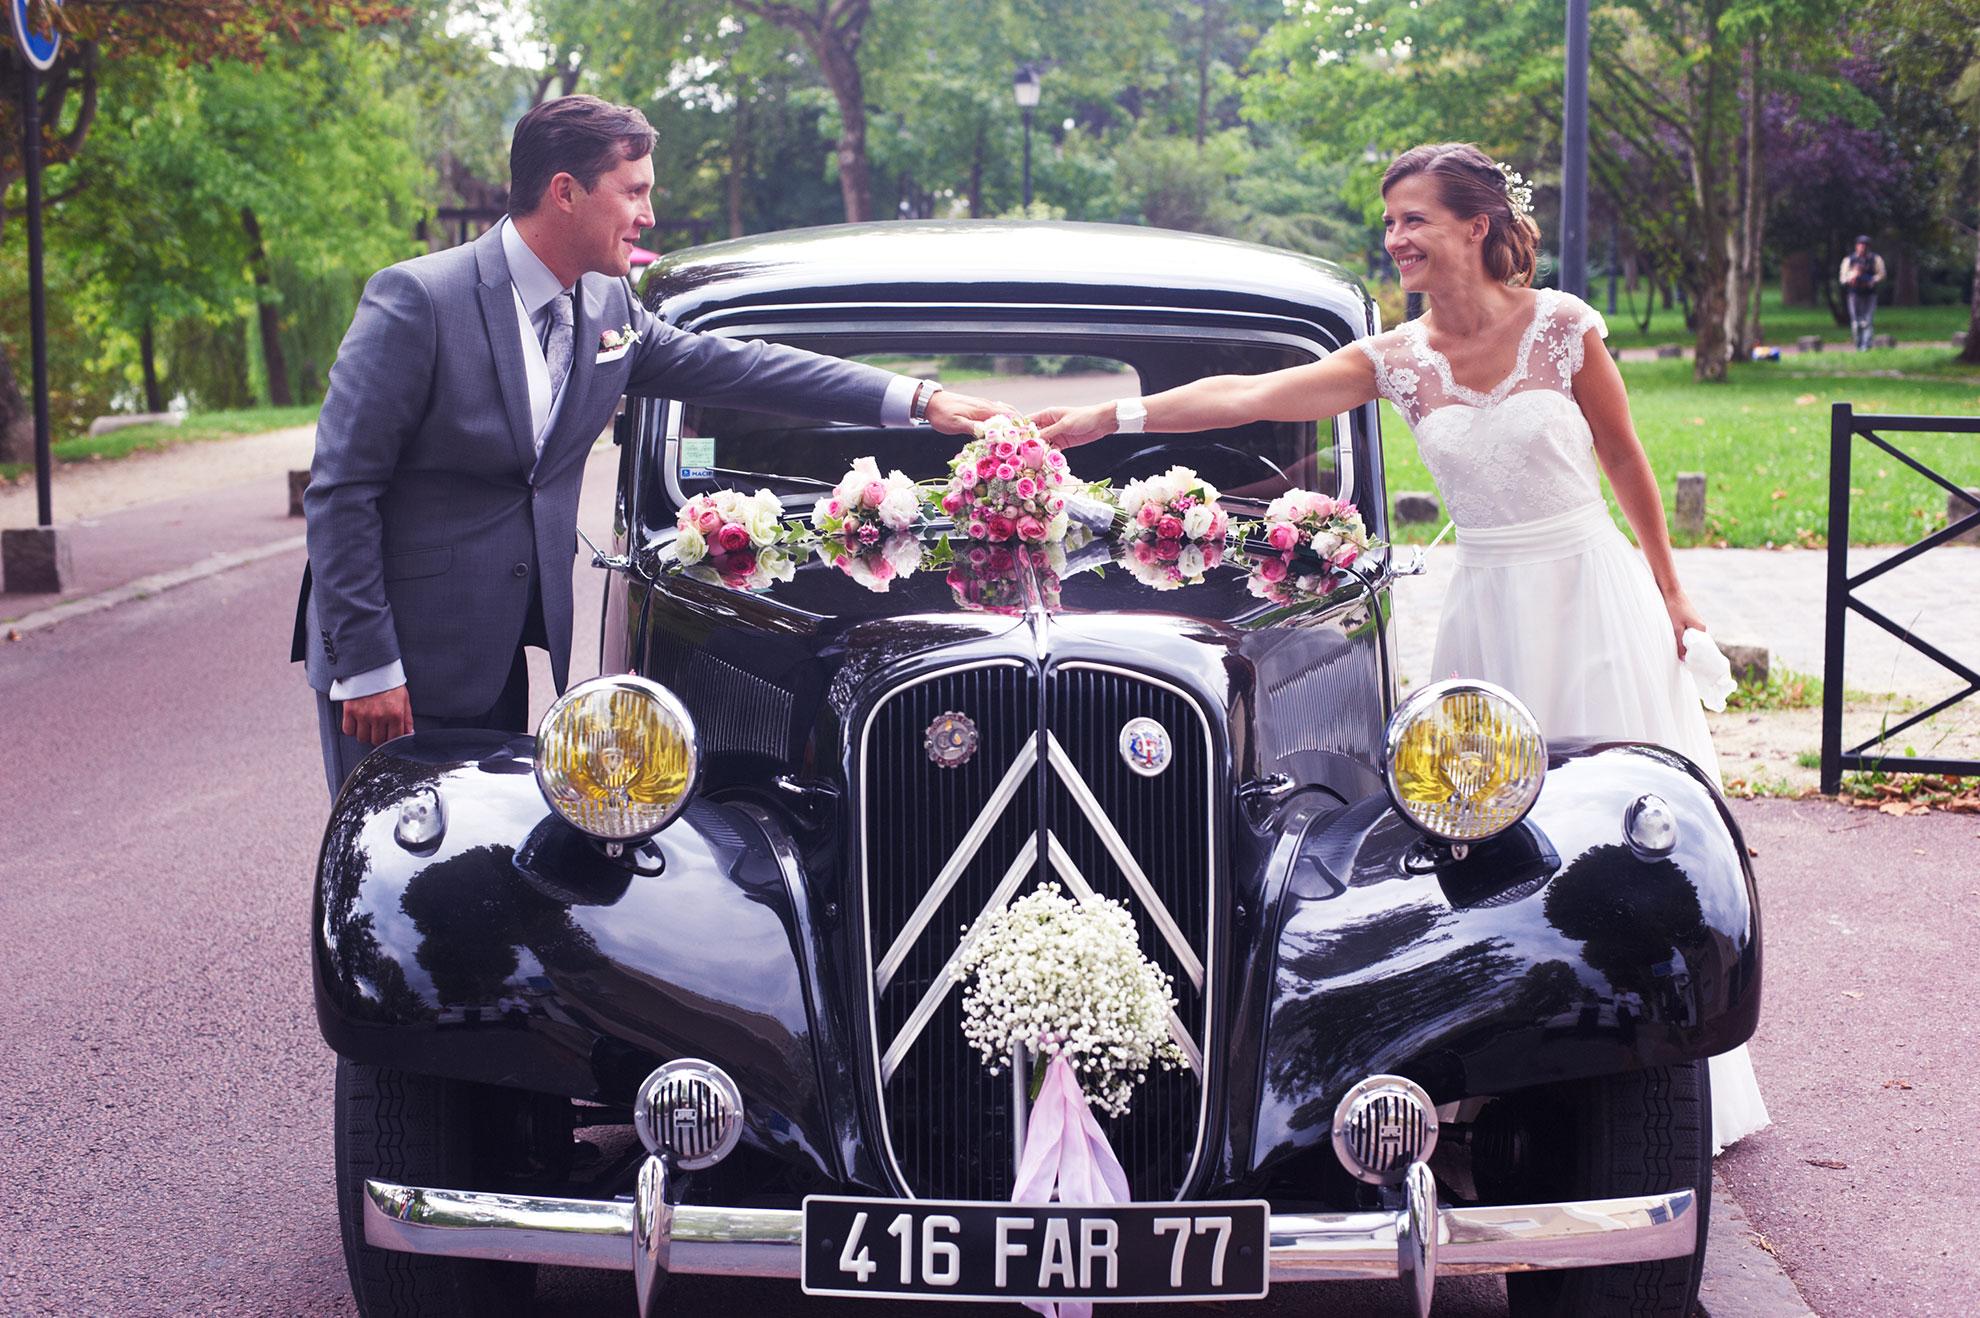 sarah_neale_photographe_mariage_04.jpg